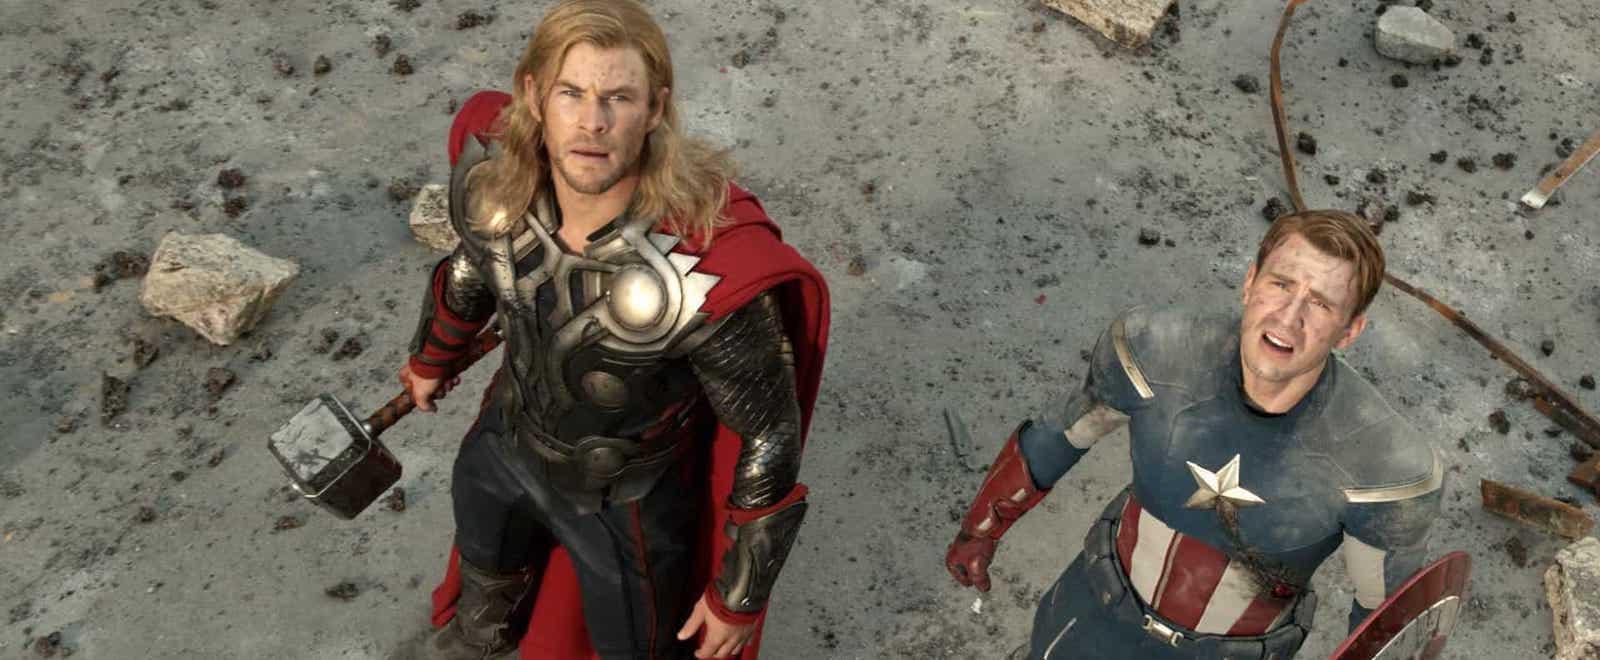 Camera Shot Guide - High Angle Shot - The Avengers - StudioBinder